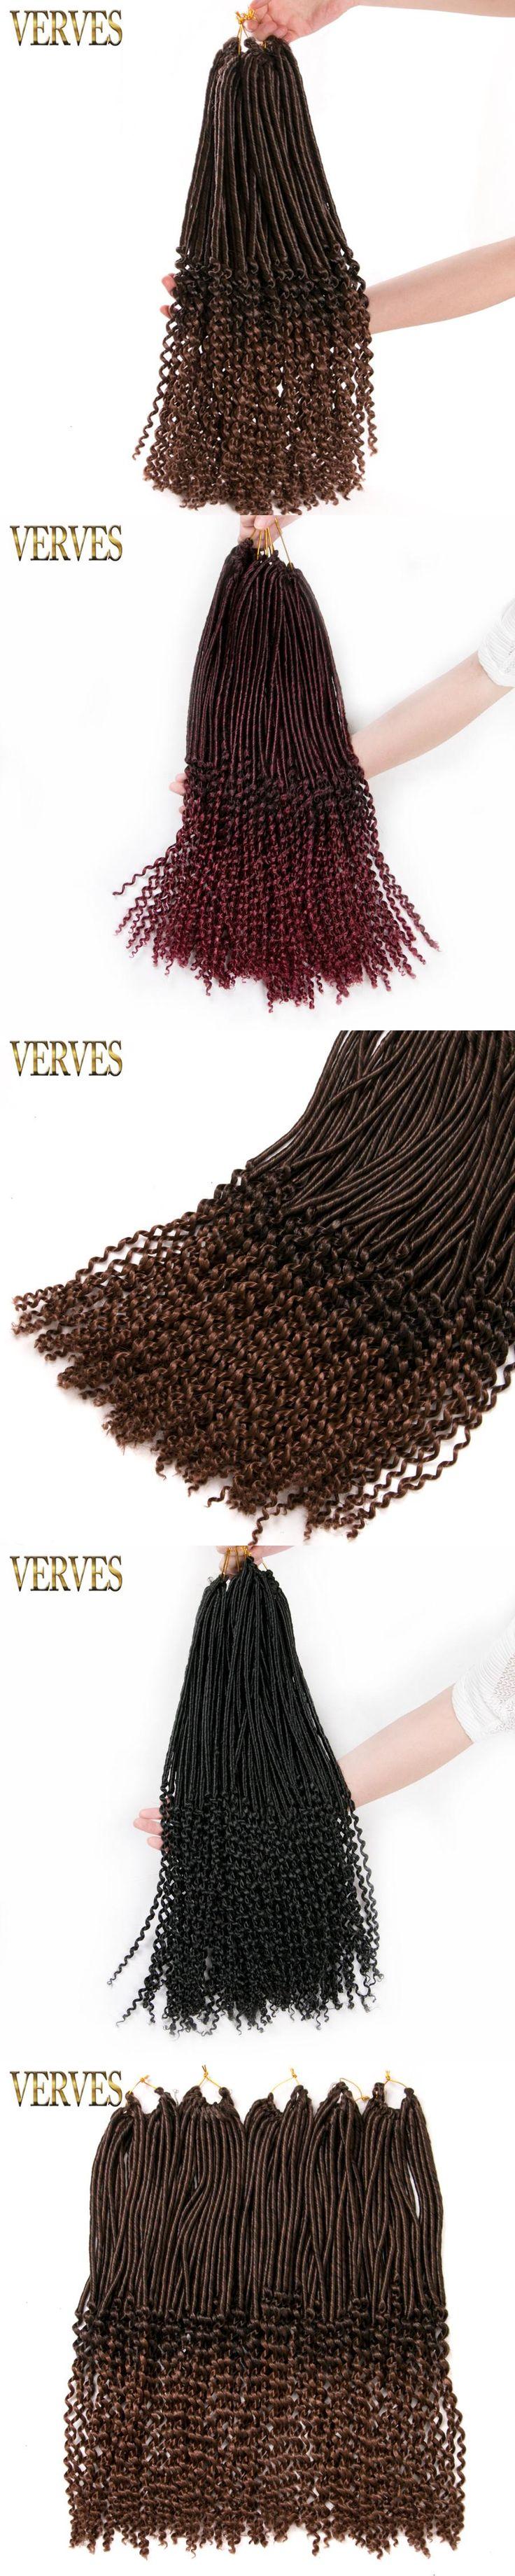 1 pack Crochet Braid hair extensions Faux Locs curly Hair 20 inch 24 strands/pack VERVES Synthetic Fiber Braiding Hair